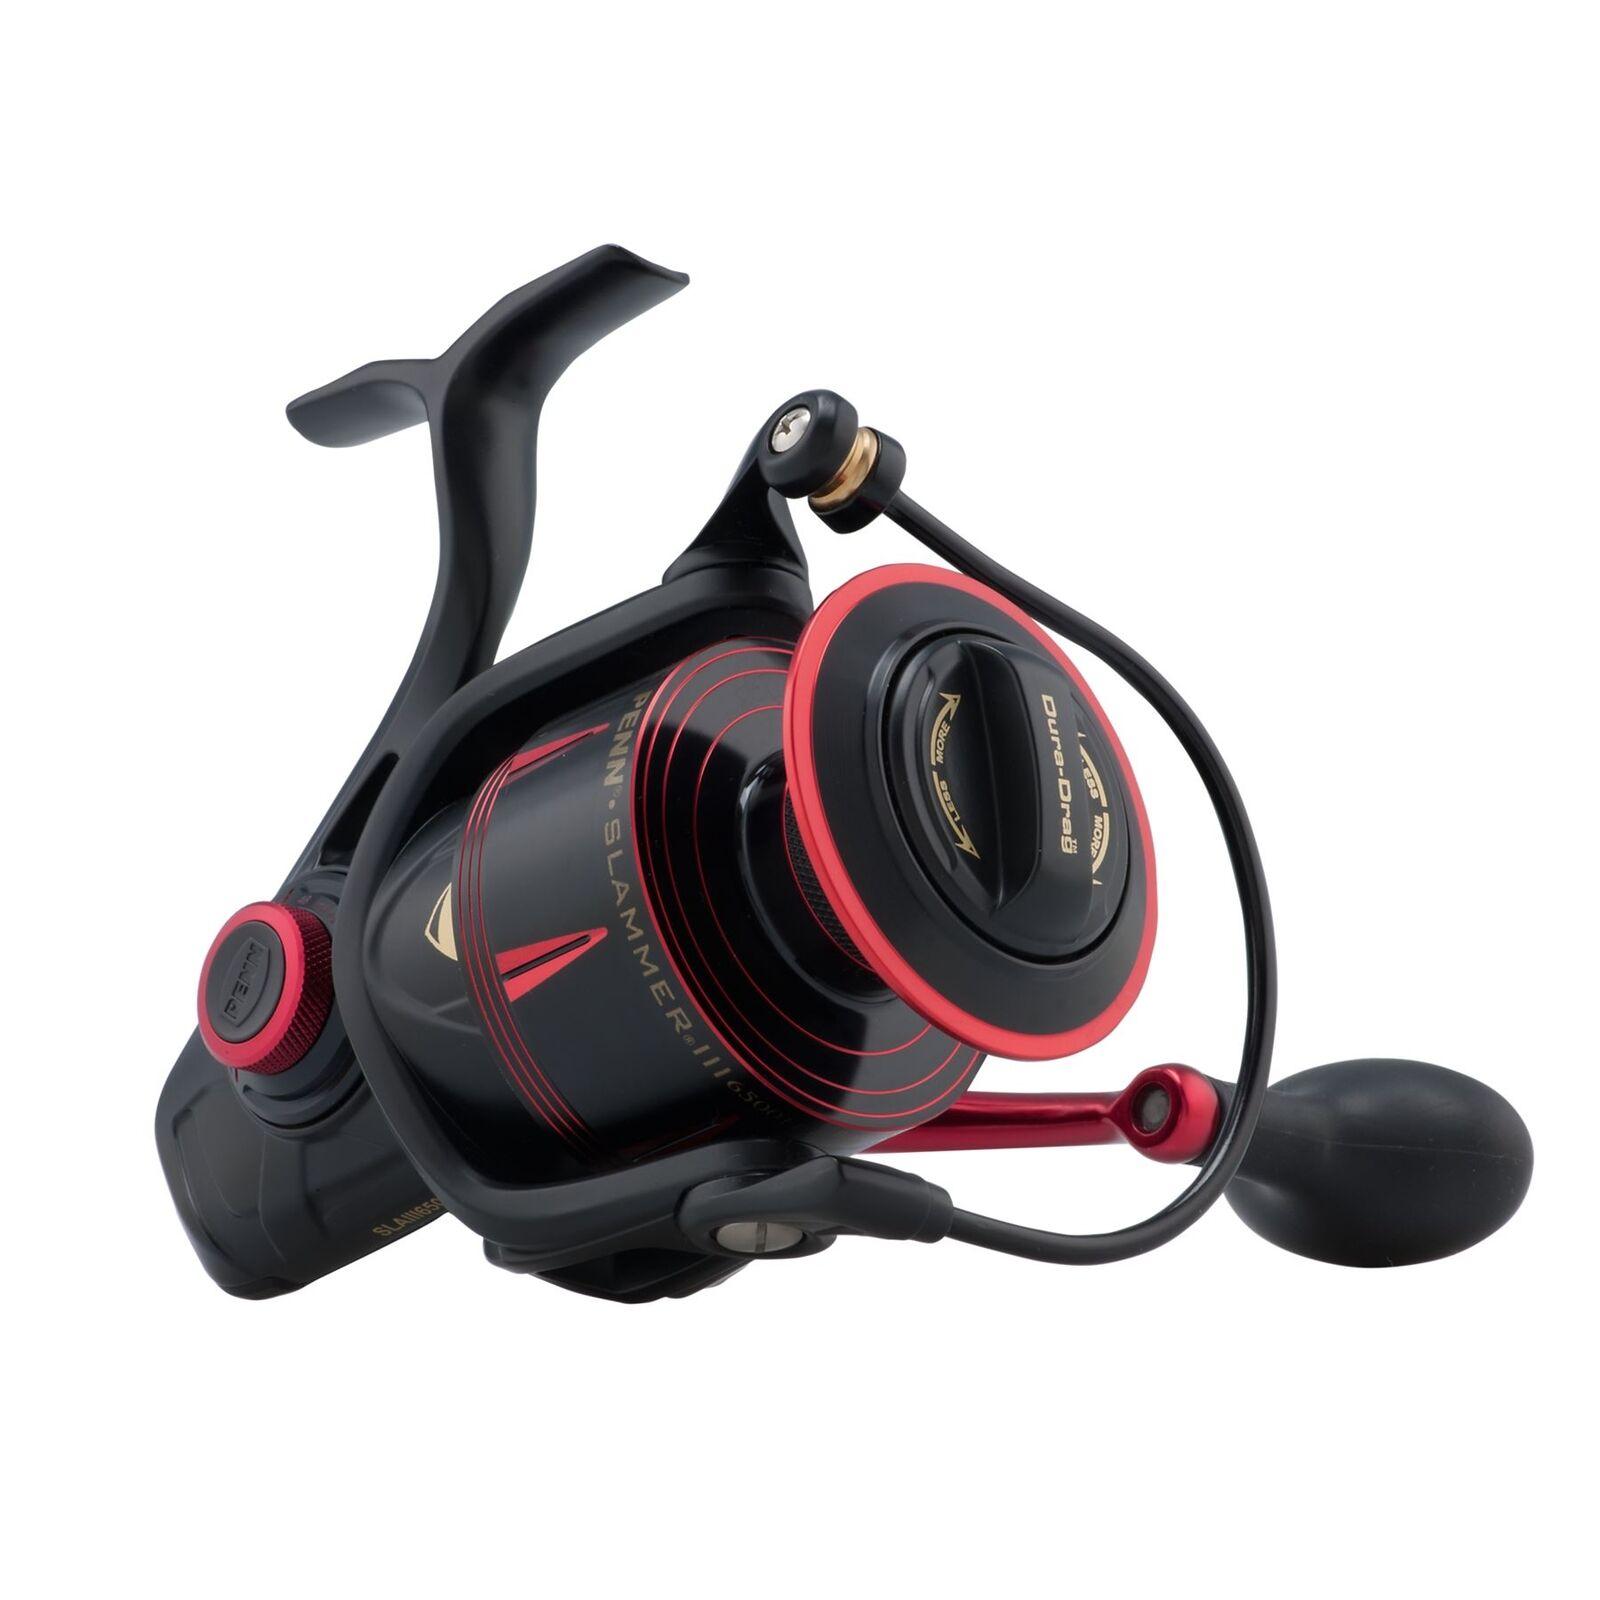 Penn Slammer III 6500 HS   Heavy Duty Spinning Fishing Reel